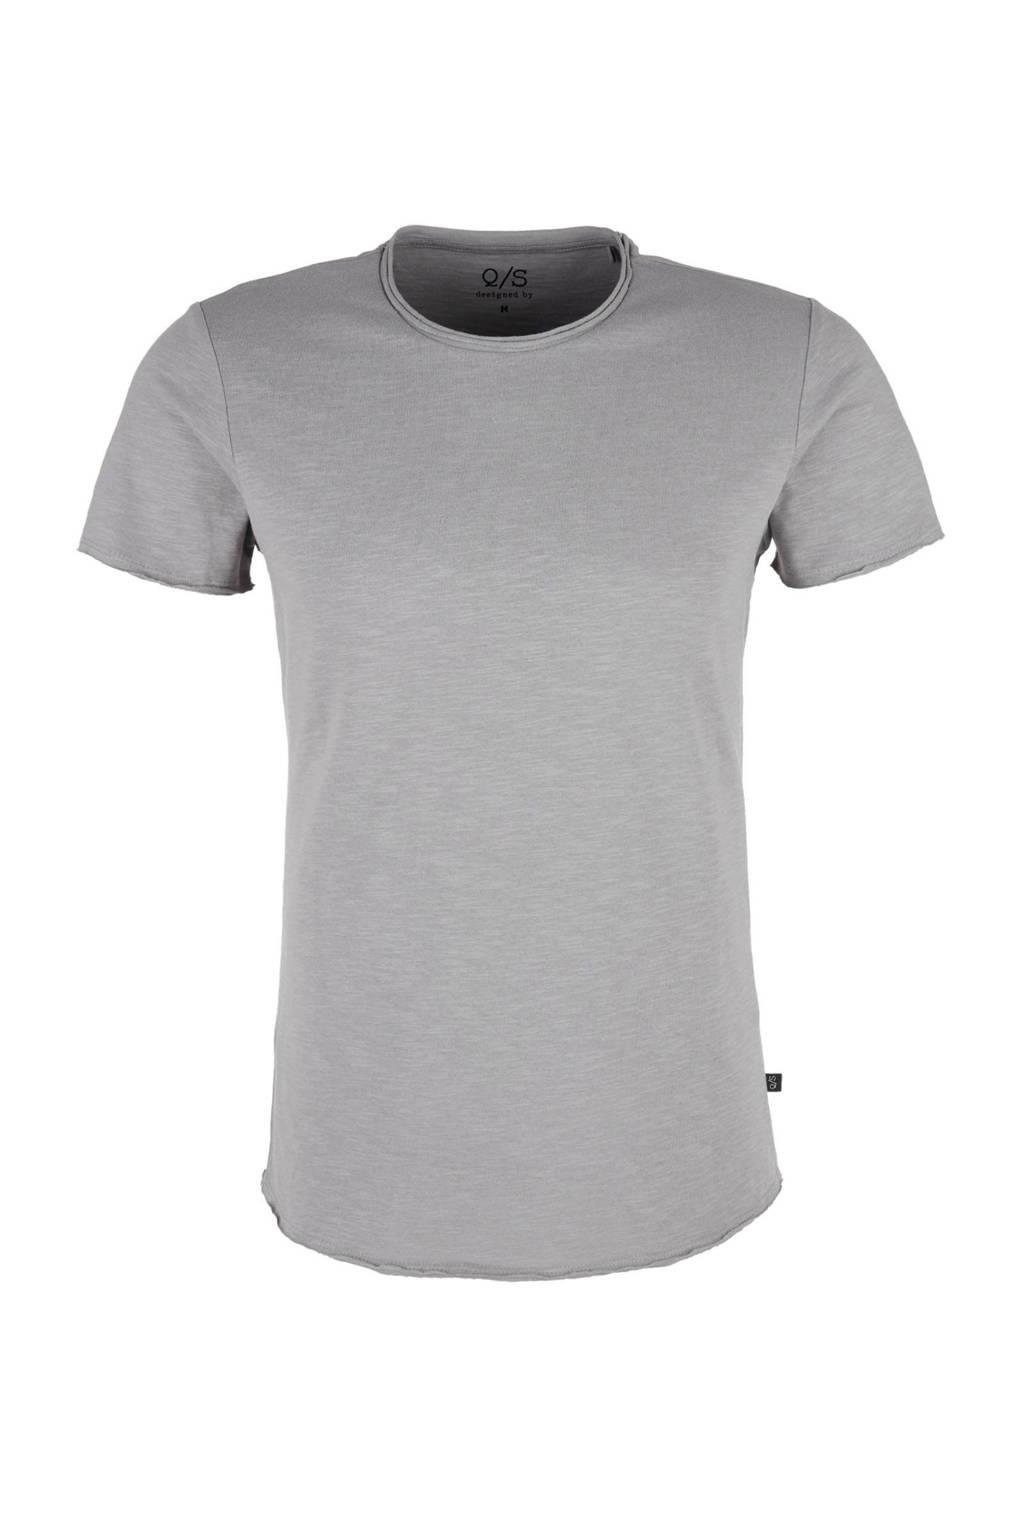 Q/S designed by basic T-shirt, Grijs